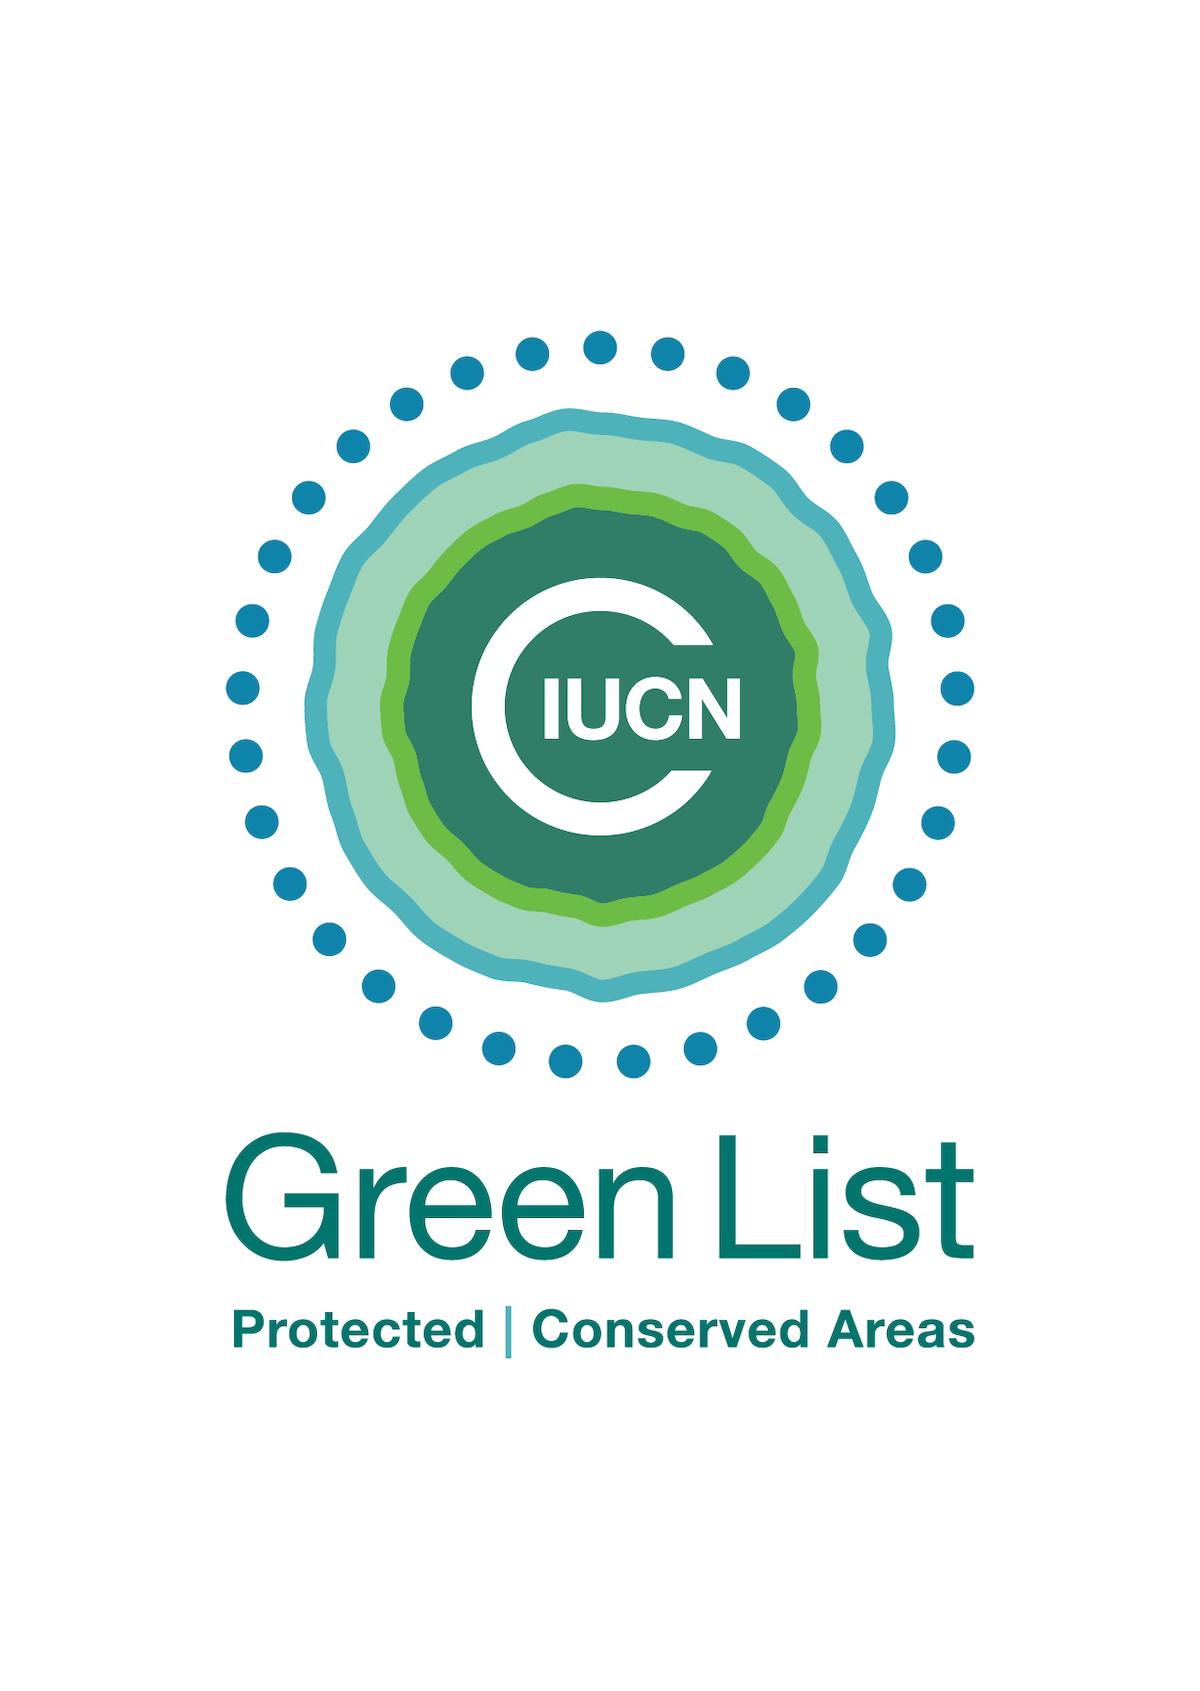 IUCN GreenList